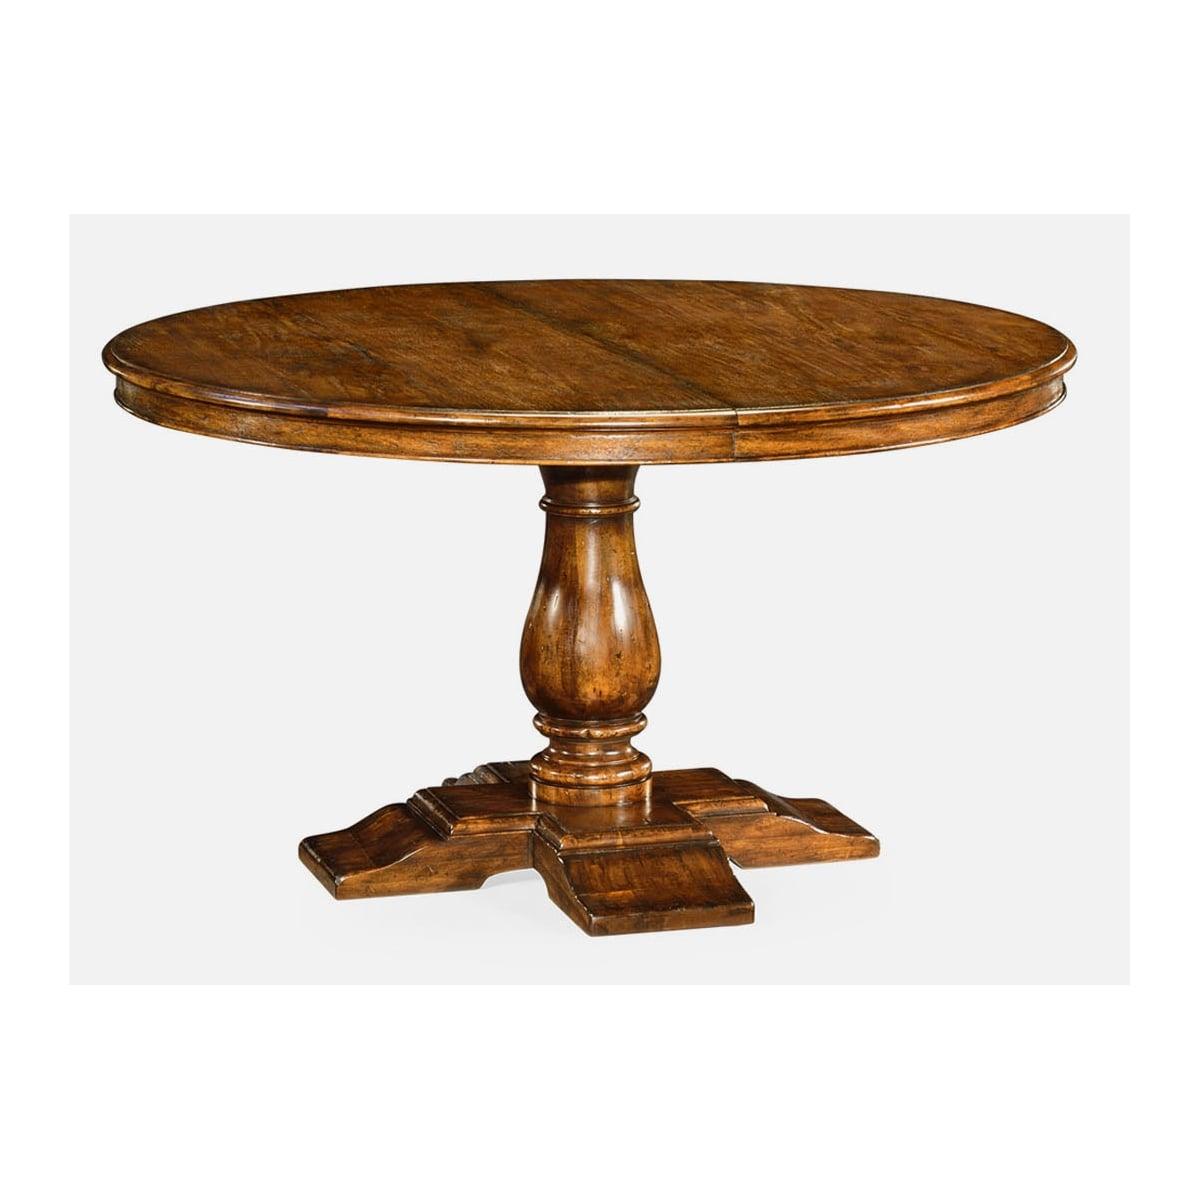 Walnut Round Extending Dining Table Swanky Interiors : 1480542360 93984500 from www.swankyinteriors.co.uk size 1200 x 1200 jpeg 69kB